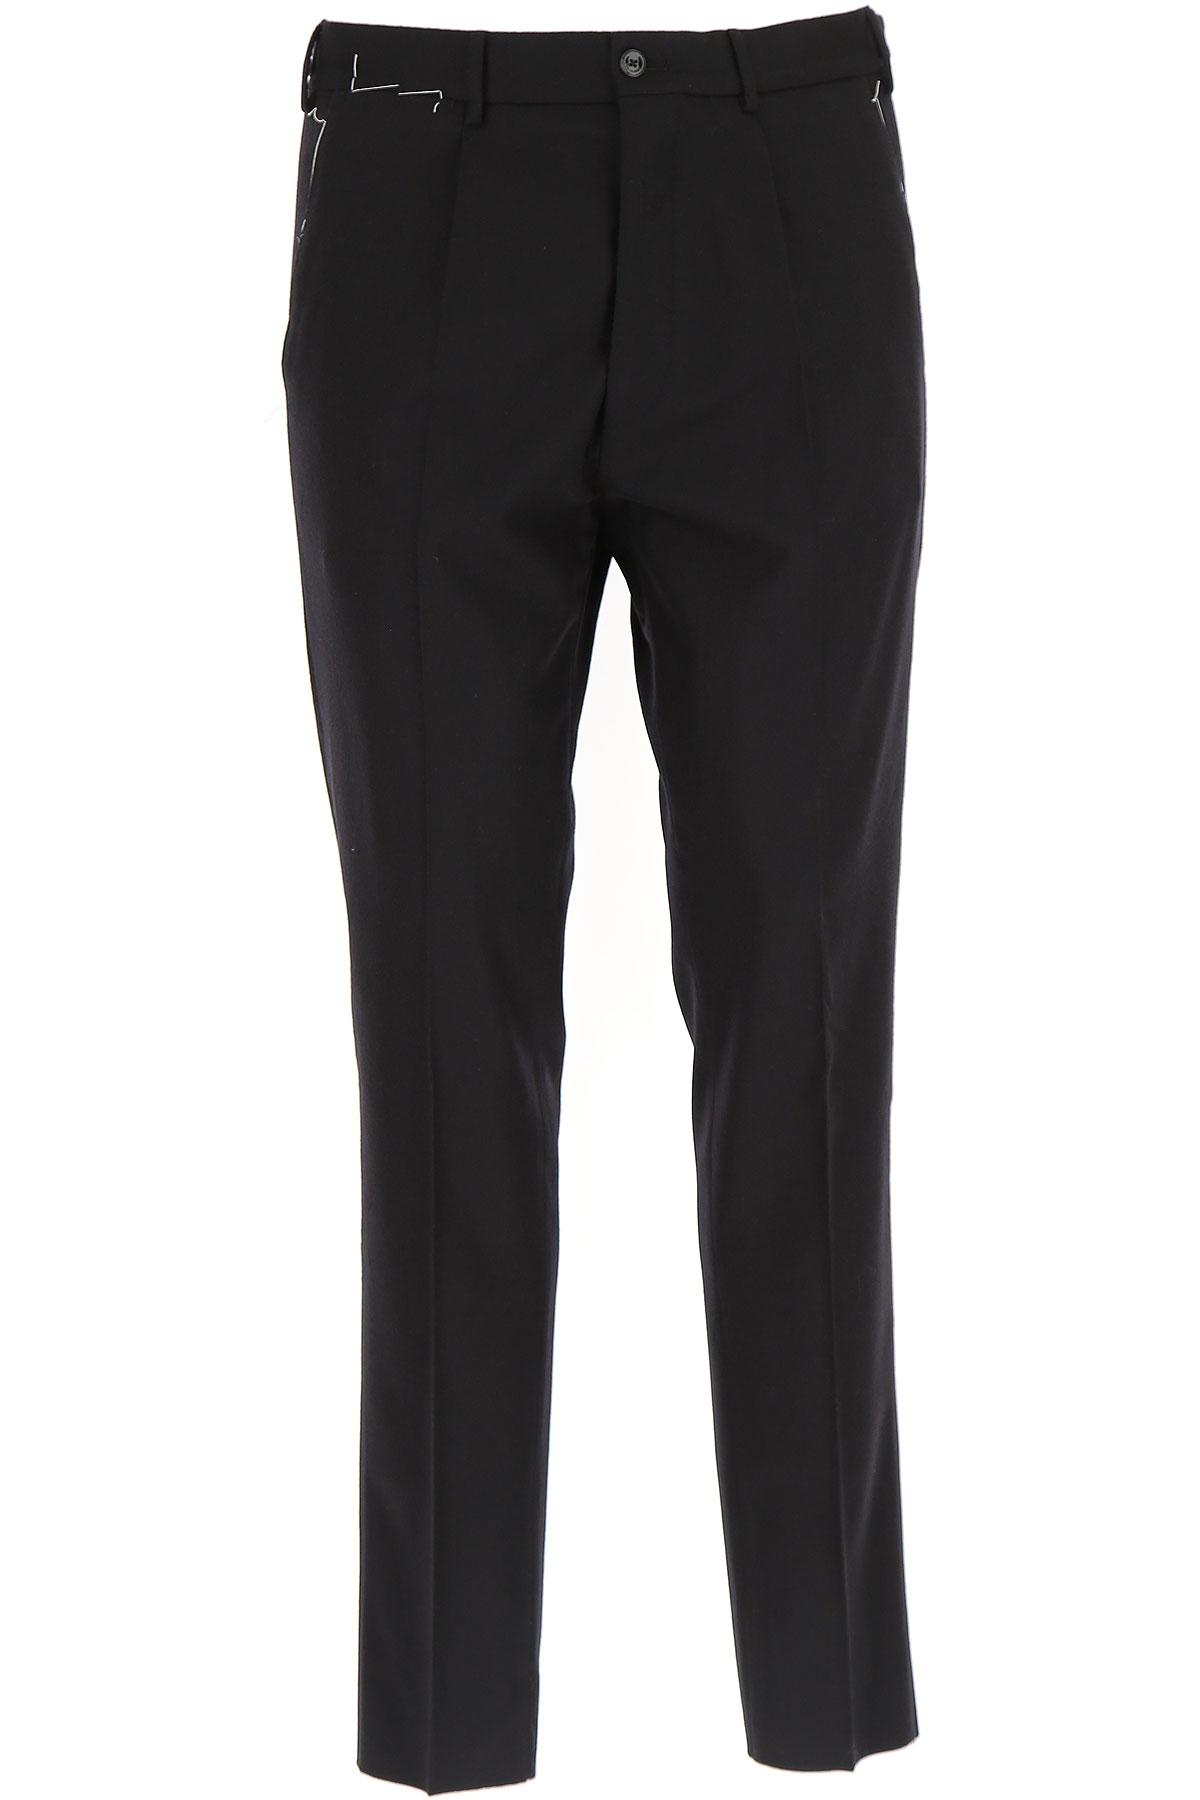 Image of PT Pantaloni Torino Pants for Men, Black, Wool, 2017, 28 30 32 34 36